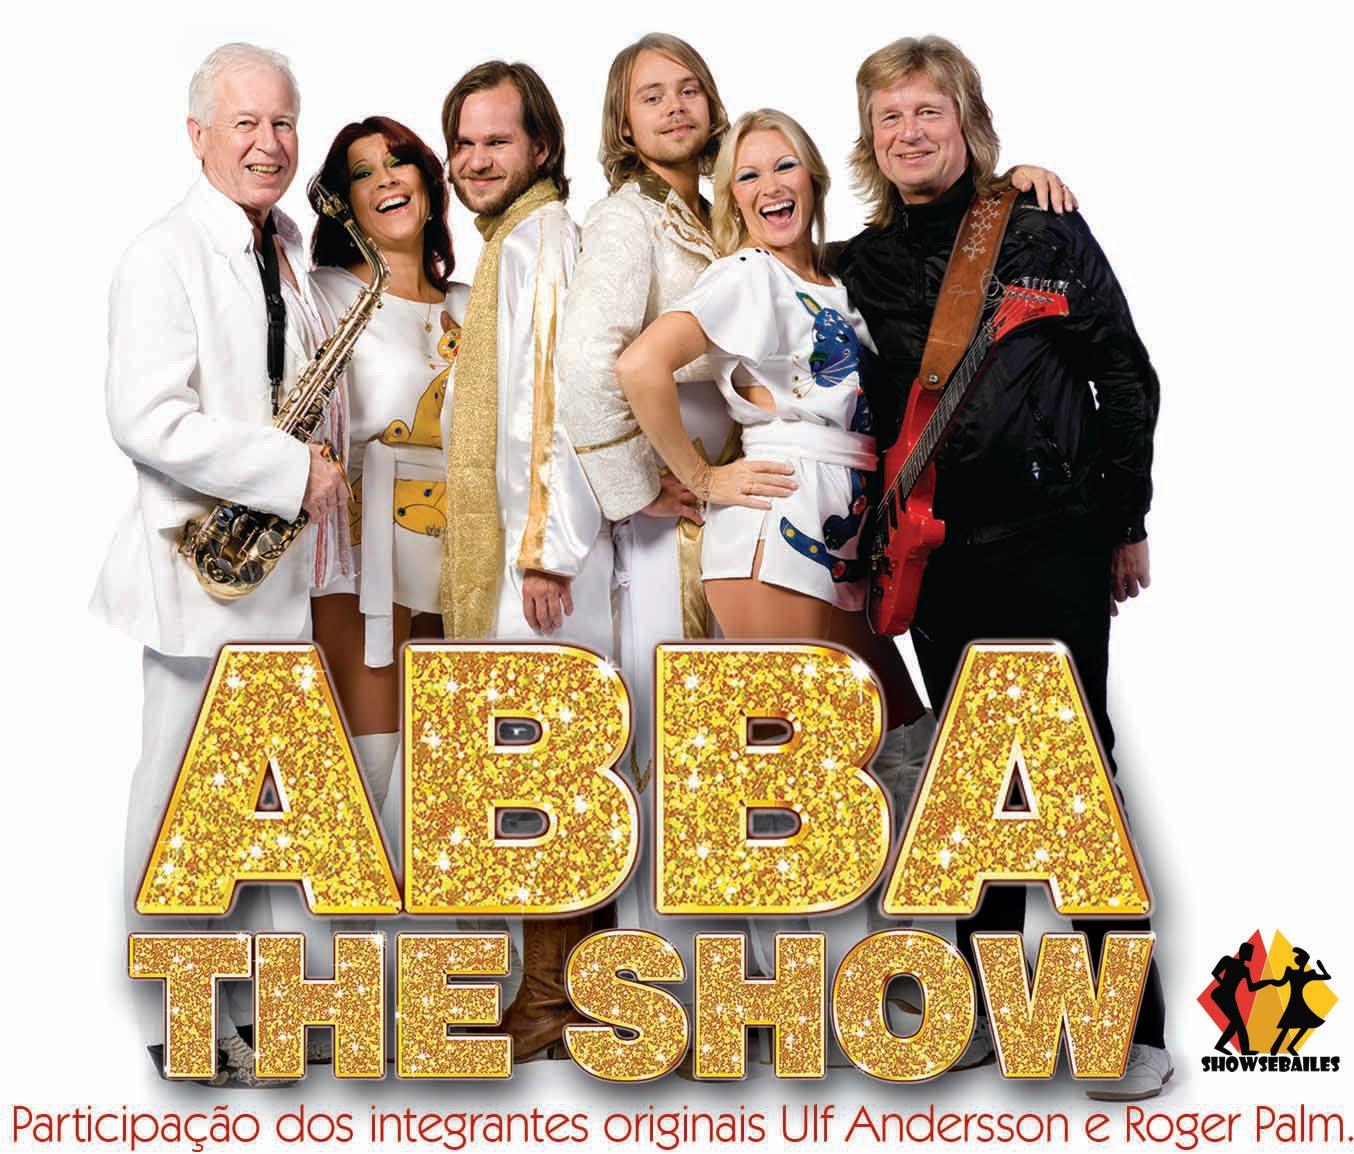 http://3.bp.blogspot.com/-Am5wfdnbBlU/T-zelg62OiI/AAAAAAAACn4/sfV6B5eTXgU/s1600/abba-the-show-sao-jose-do-rio-preto-aquelesite.jpg